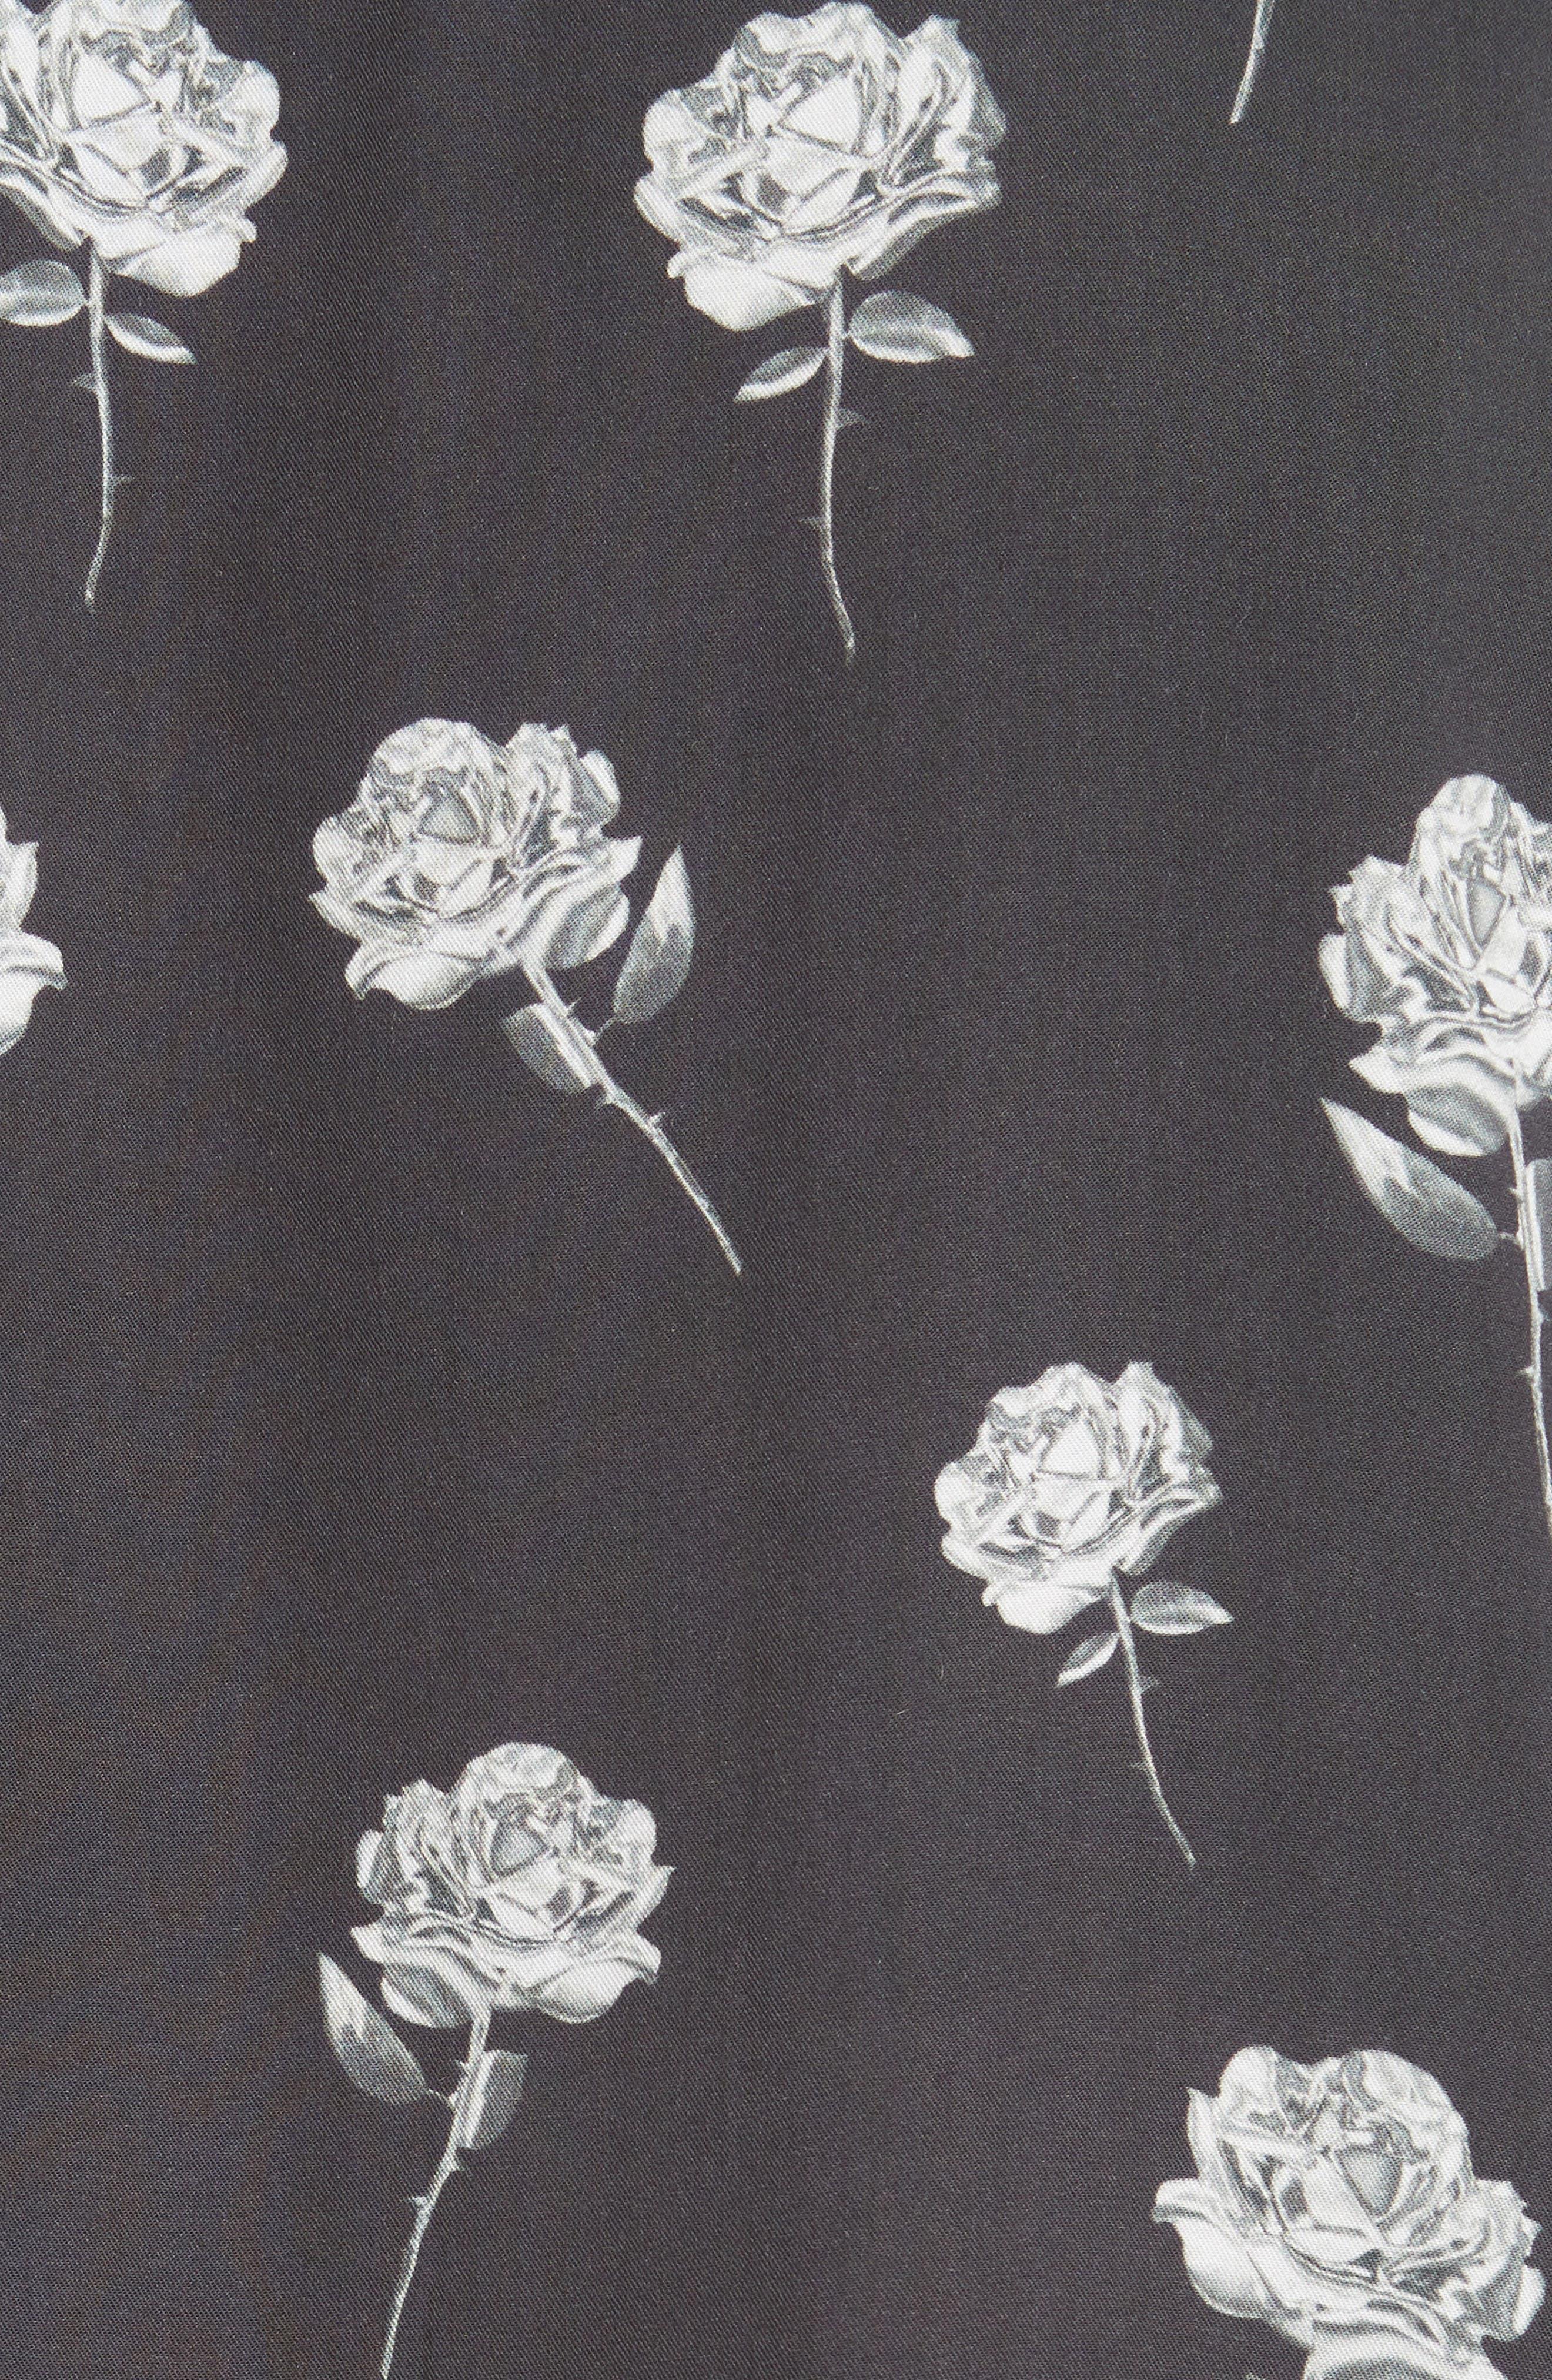 Chrome Rose Print Shirt,                             Alternate thumbnail 5, color,                             BROWN